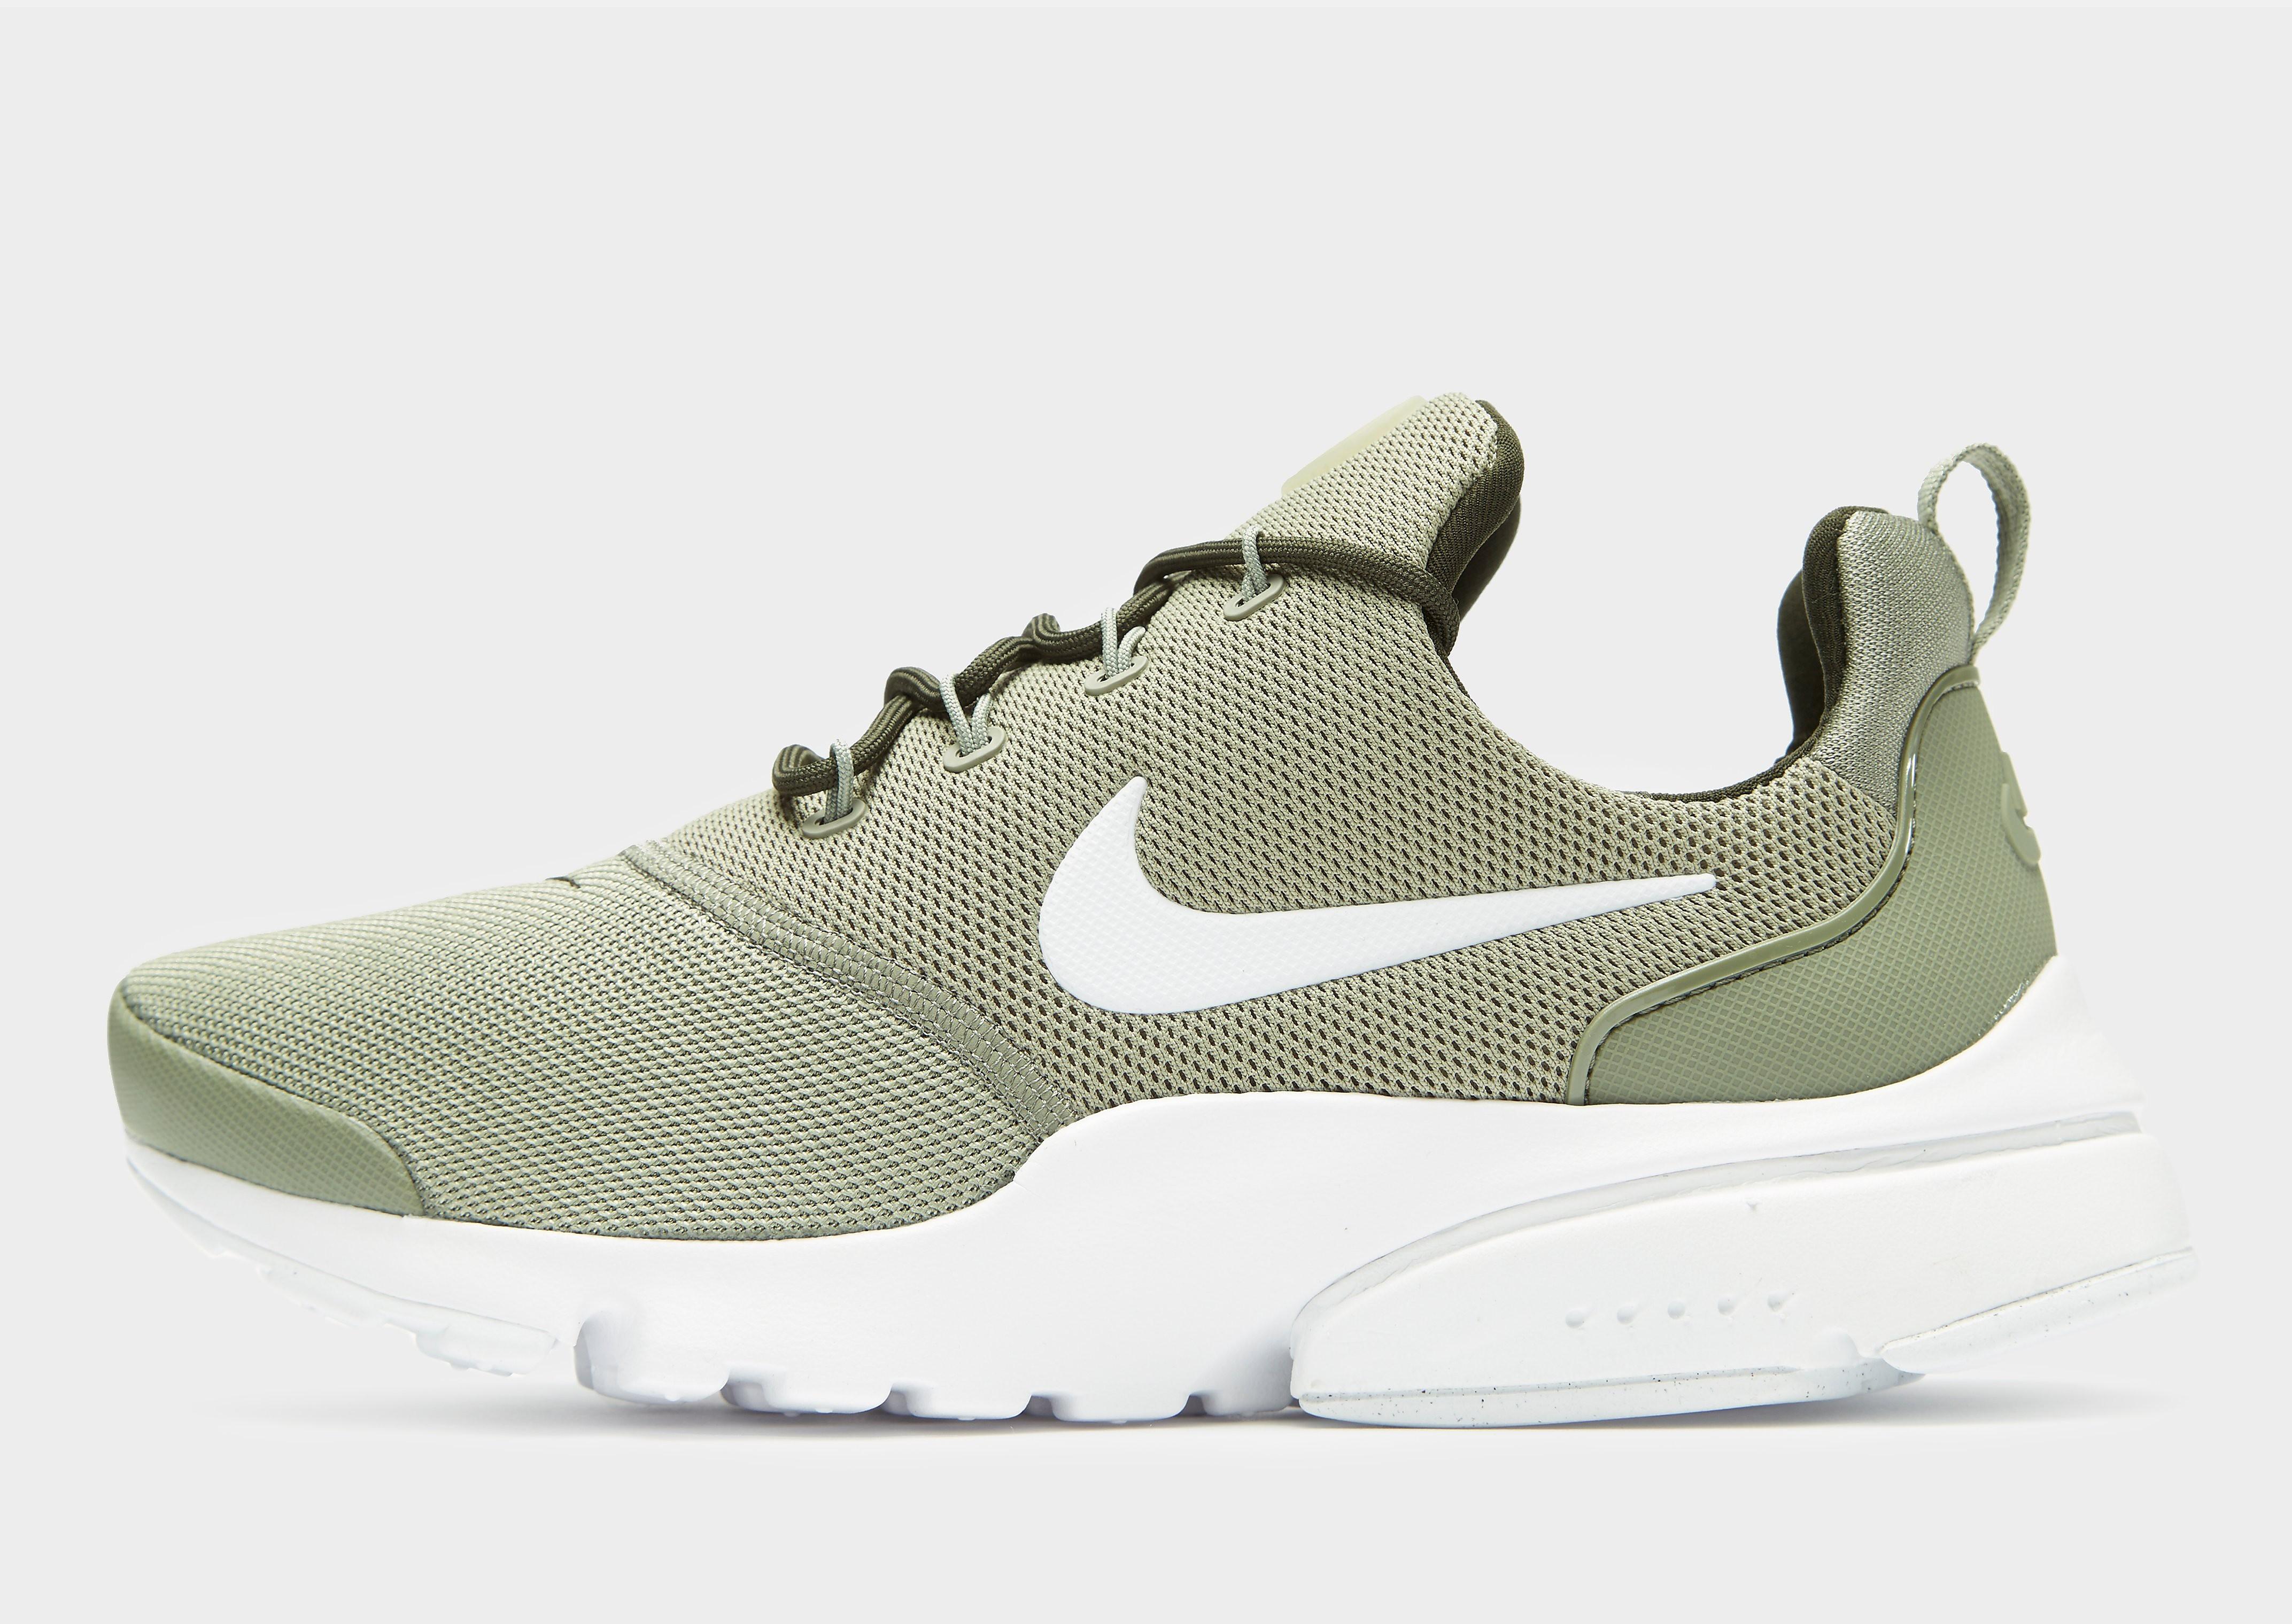 Nike Air Presto Femme